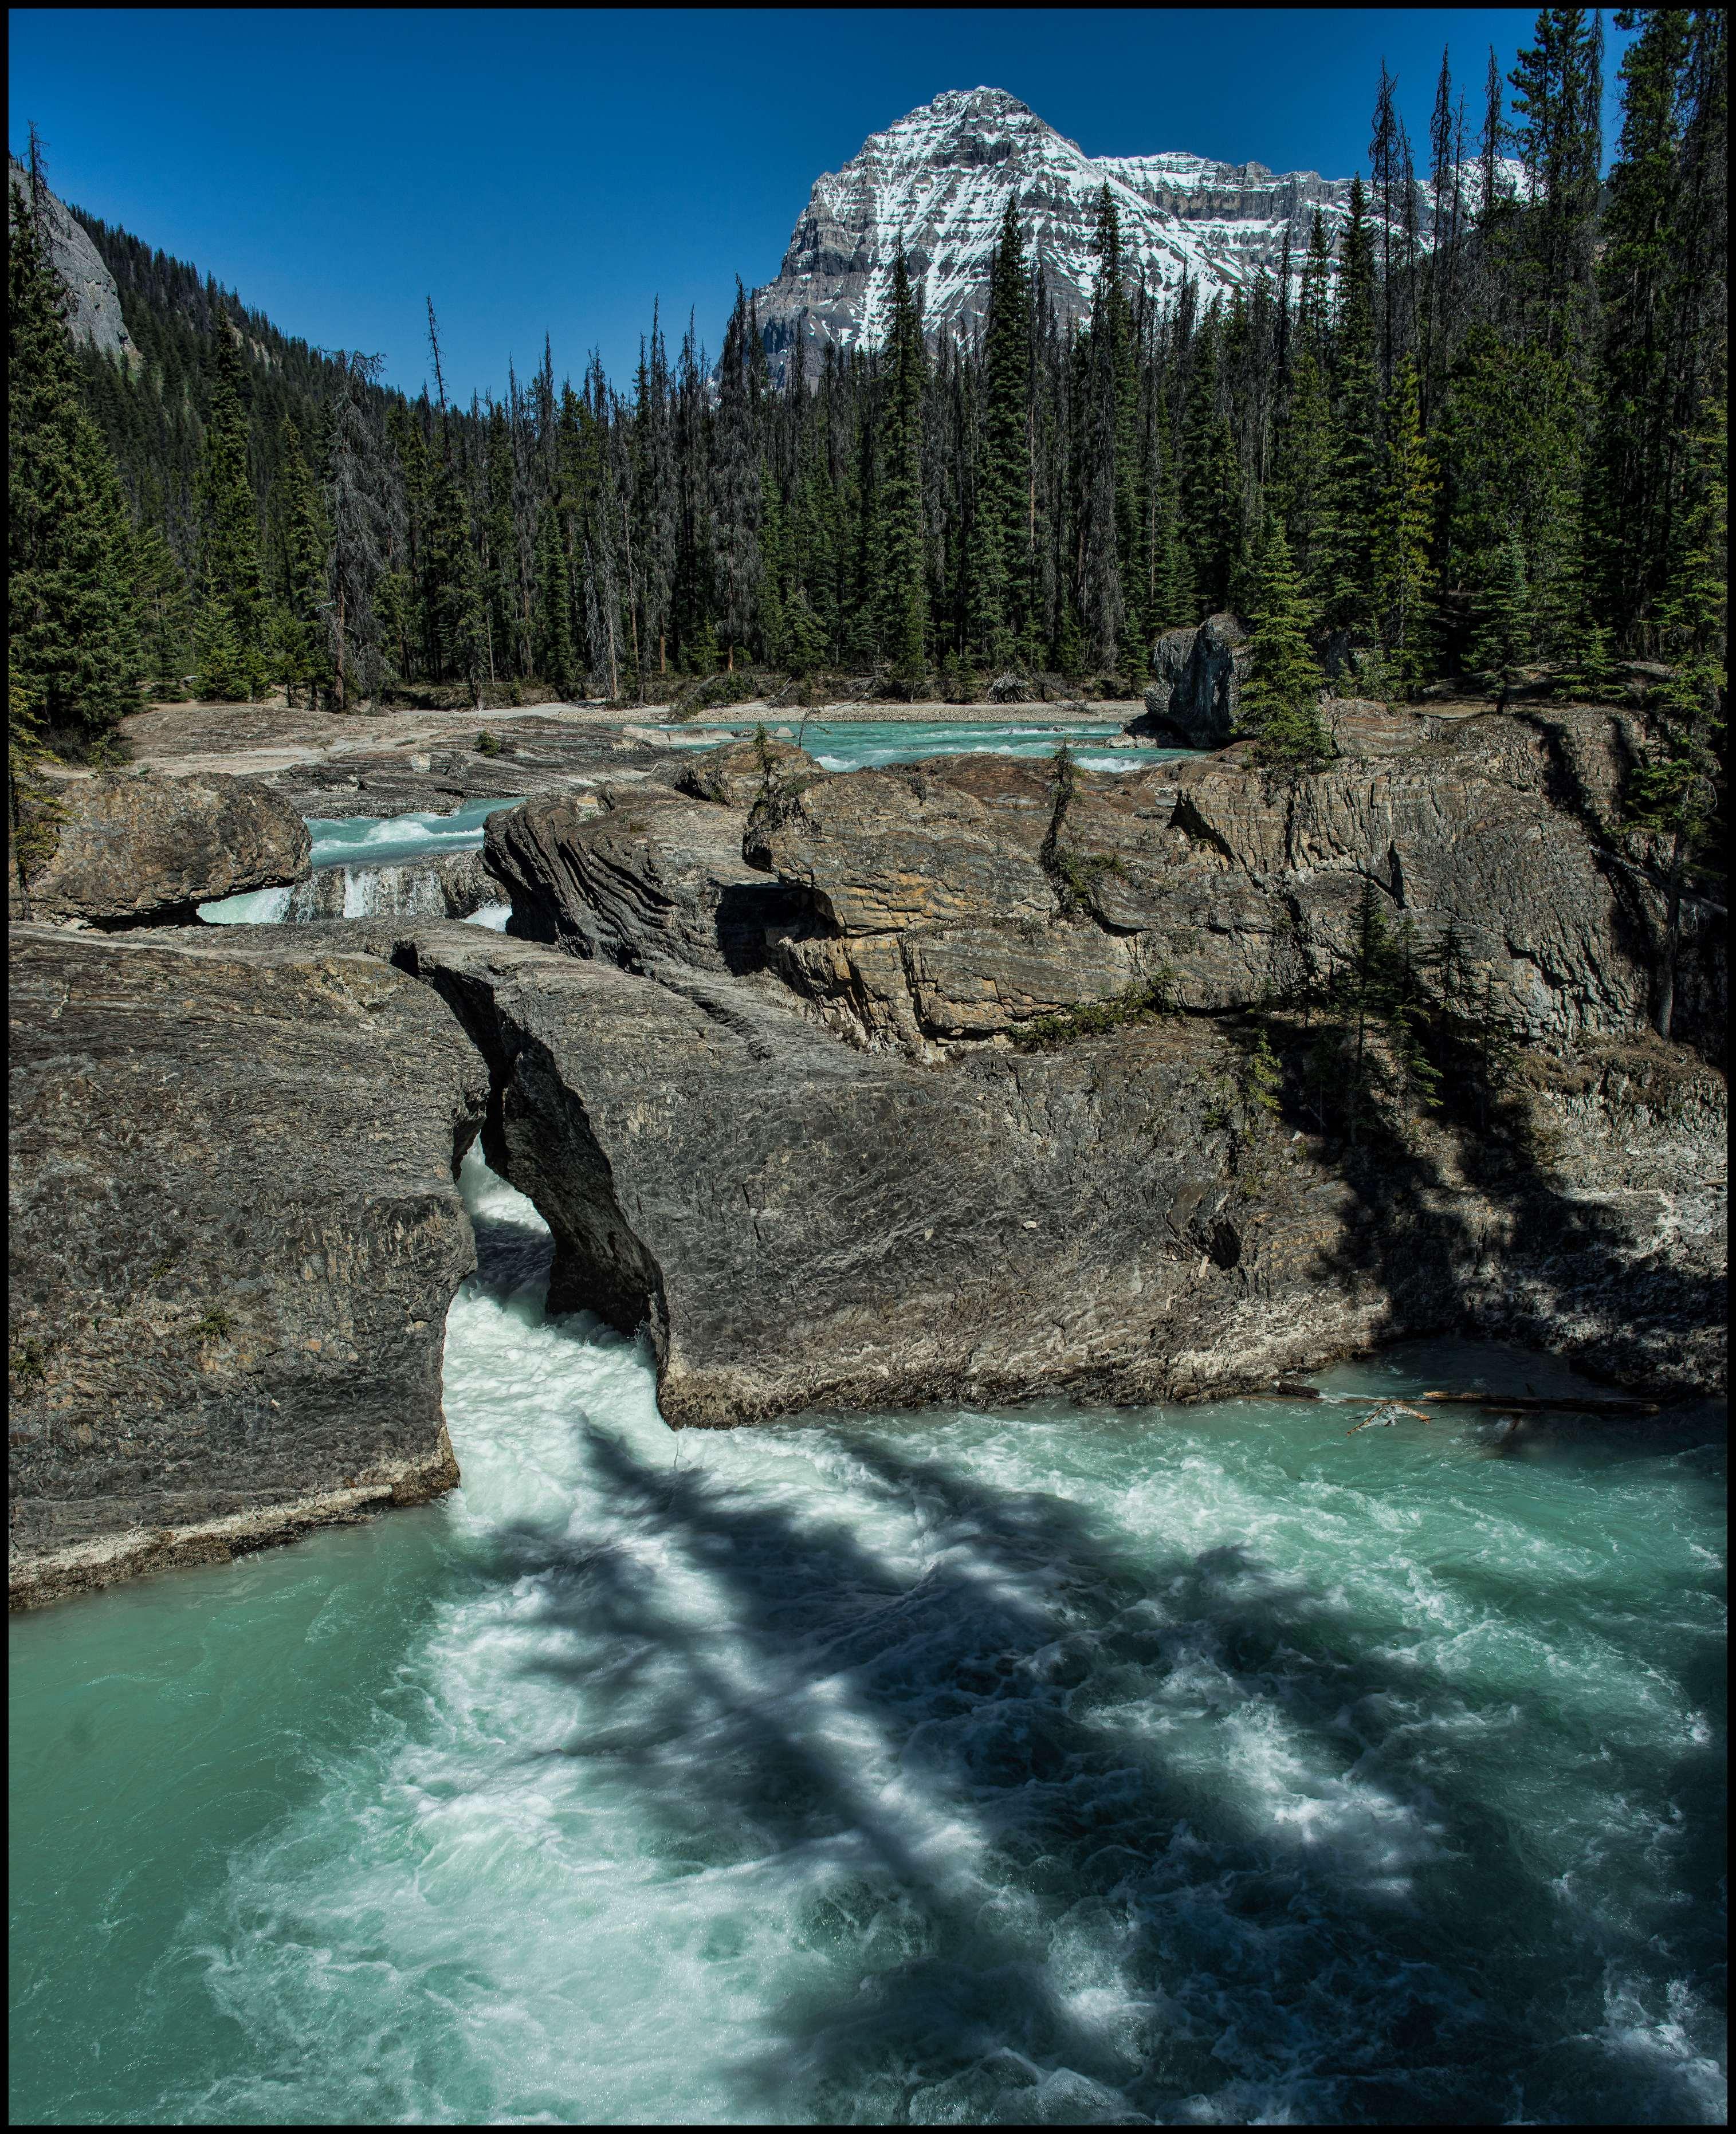 Natural bridge / Kicking horse river, Yoho National Park Sony A7 / Canon FD Tilt Shift 35 2.8